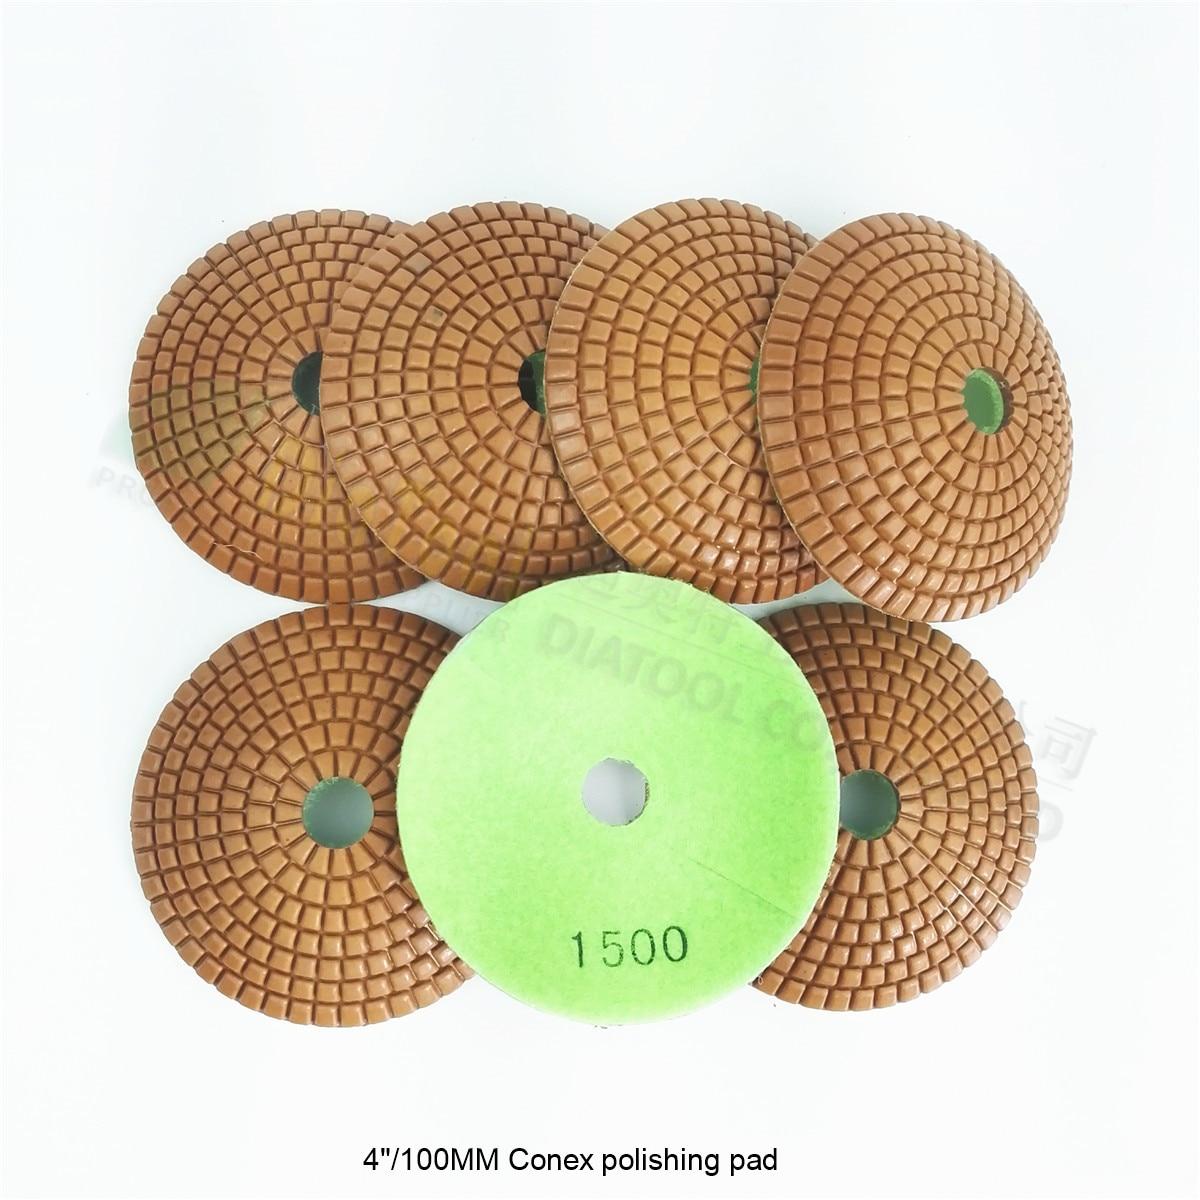 "SHDIATOOL 7pcs 4"" #1500 bowl shaped wet diamond polishing pads marble granite ceramic Diameter 100mm convex sanding disc"